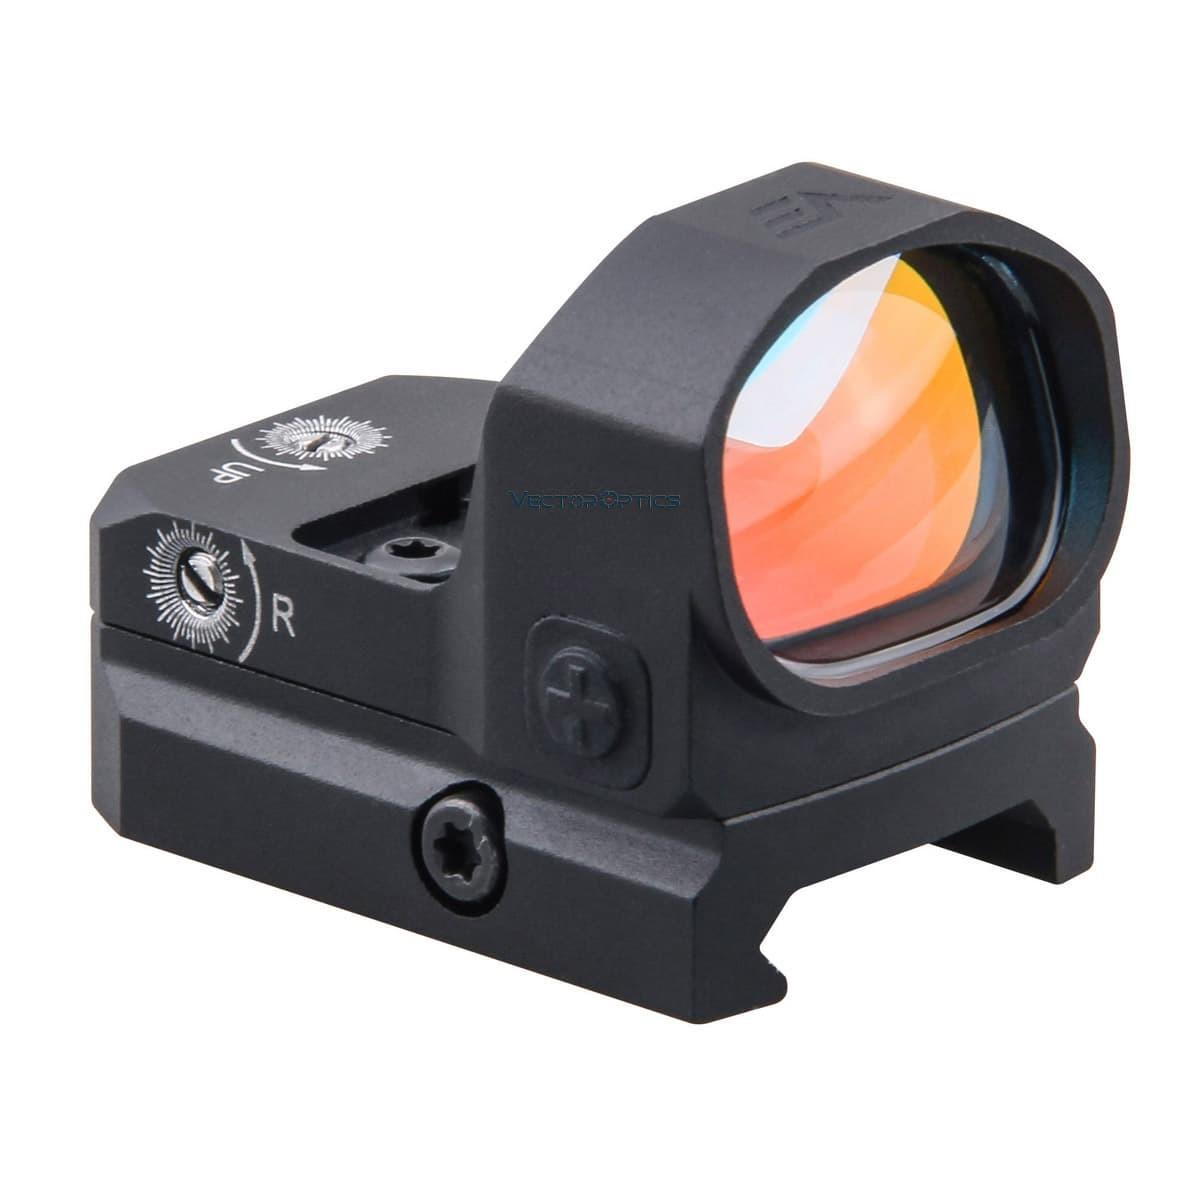 VectorOptics SCRD-35 Frenzy2 1X20X28